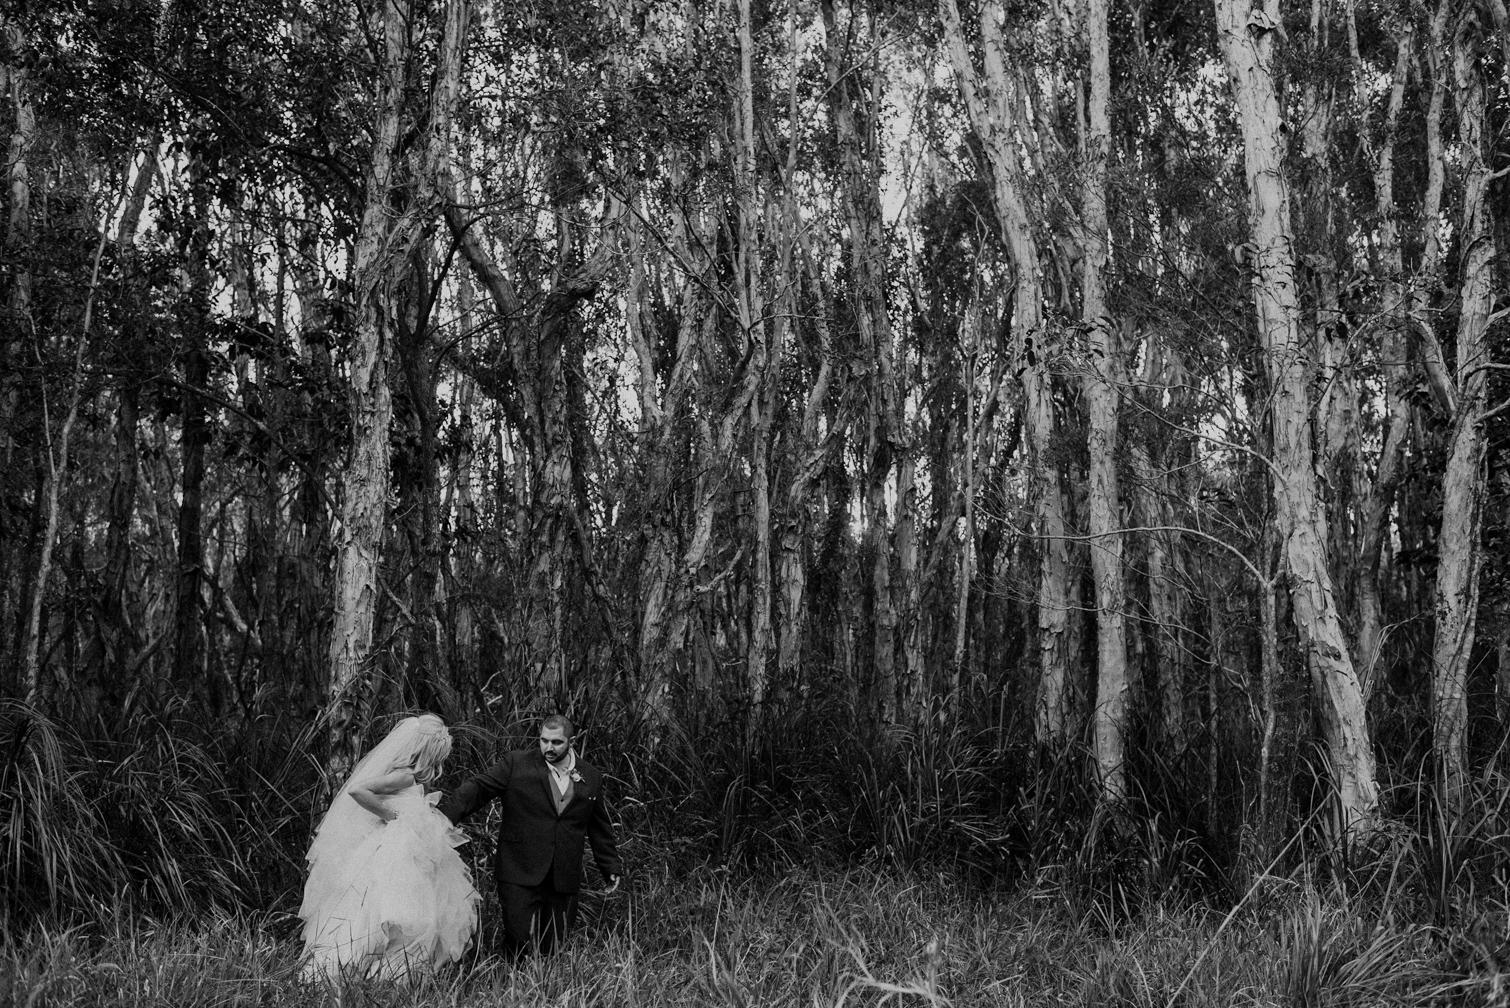 The_Belongil_Byron_Bay_Weddings_New_Black_Studios-135.jpg